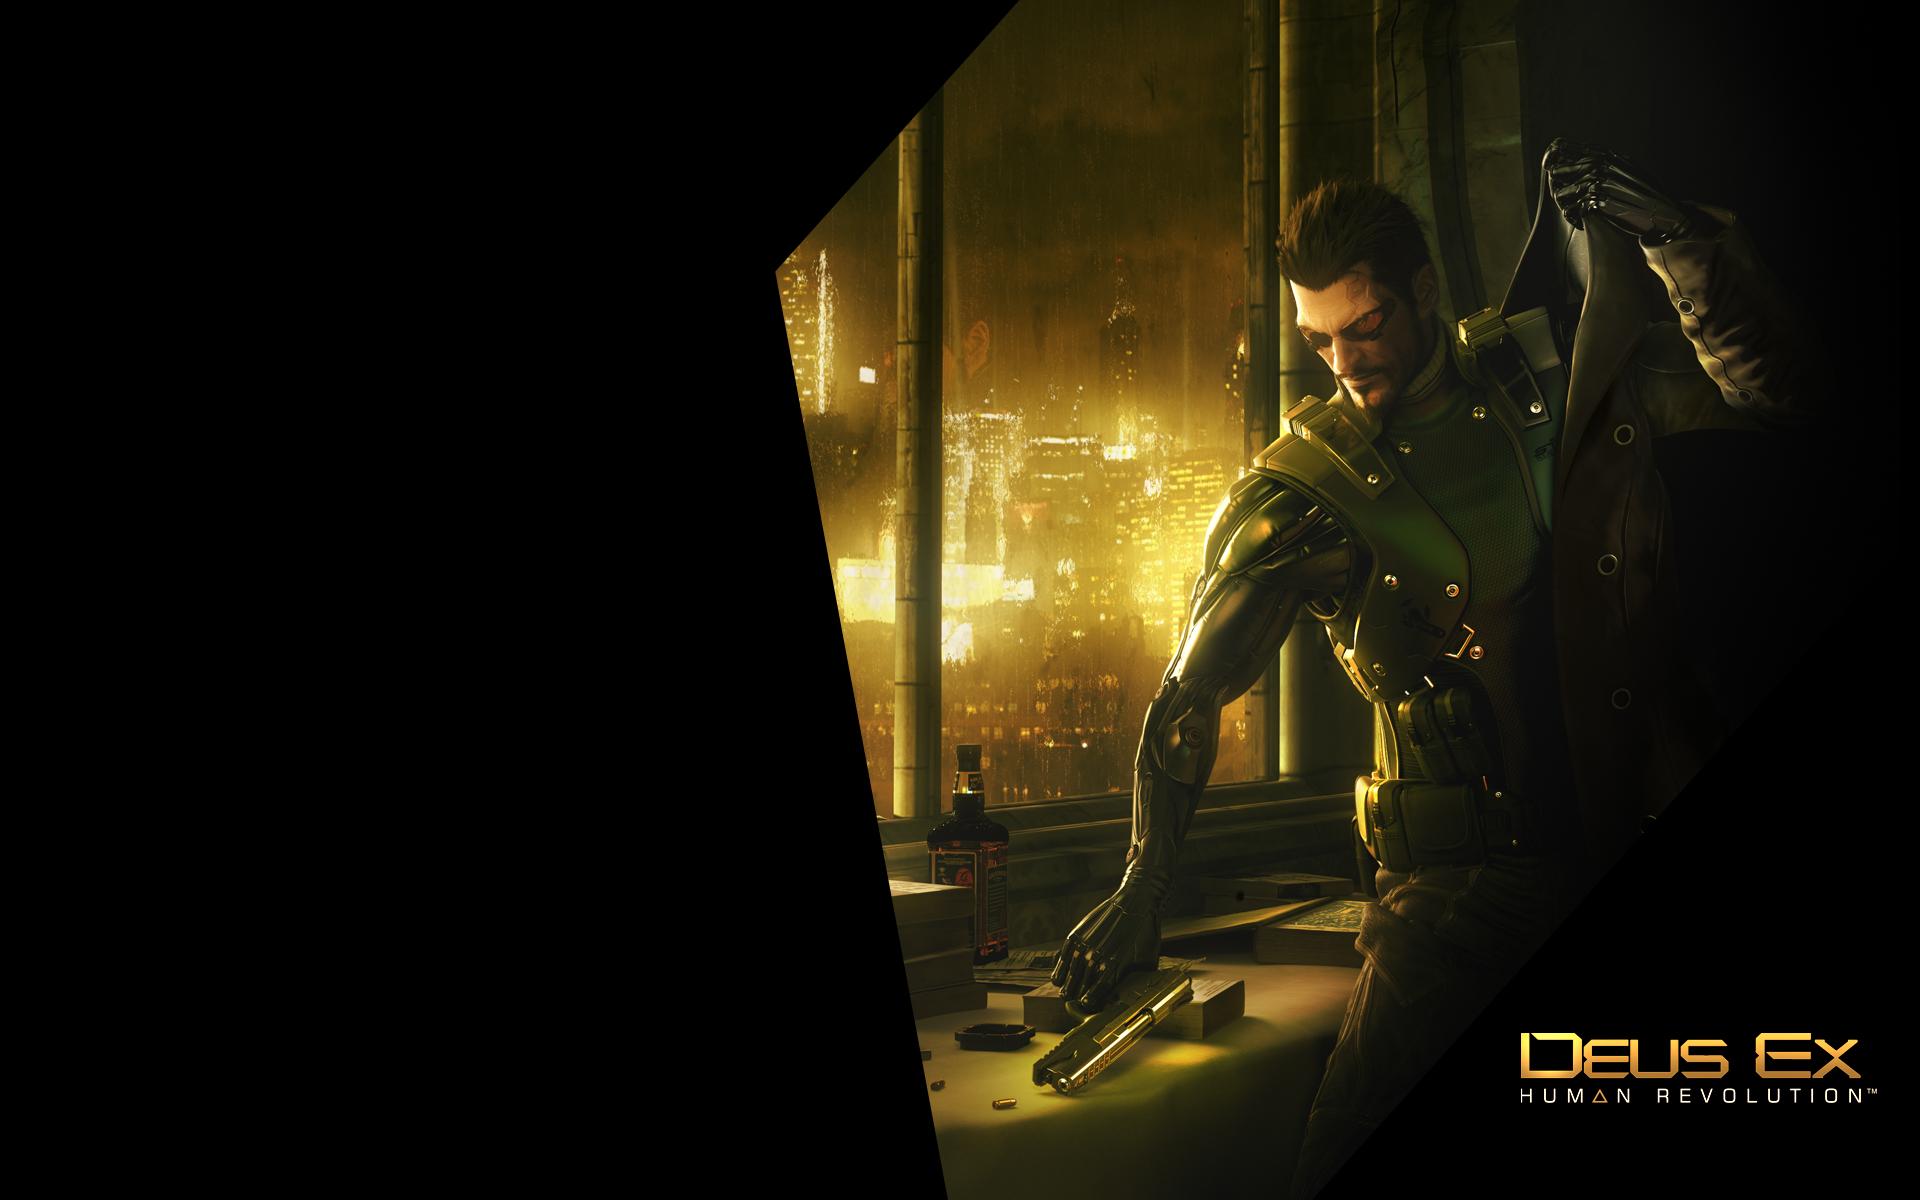 48 Deus Ex Wallpaper Hd On Wallpapersafari